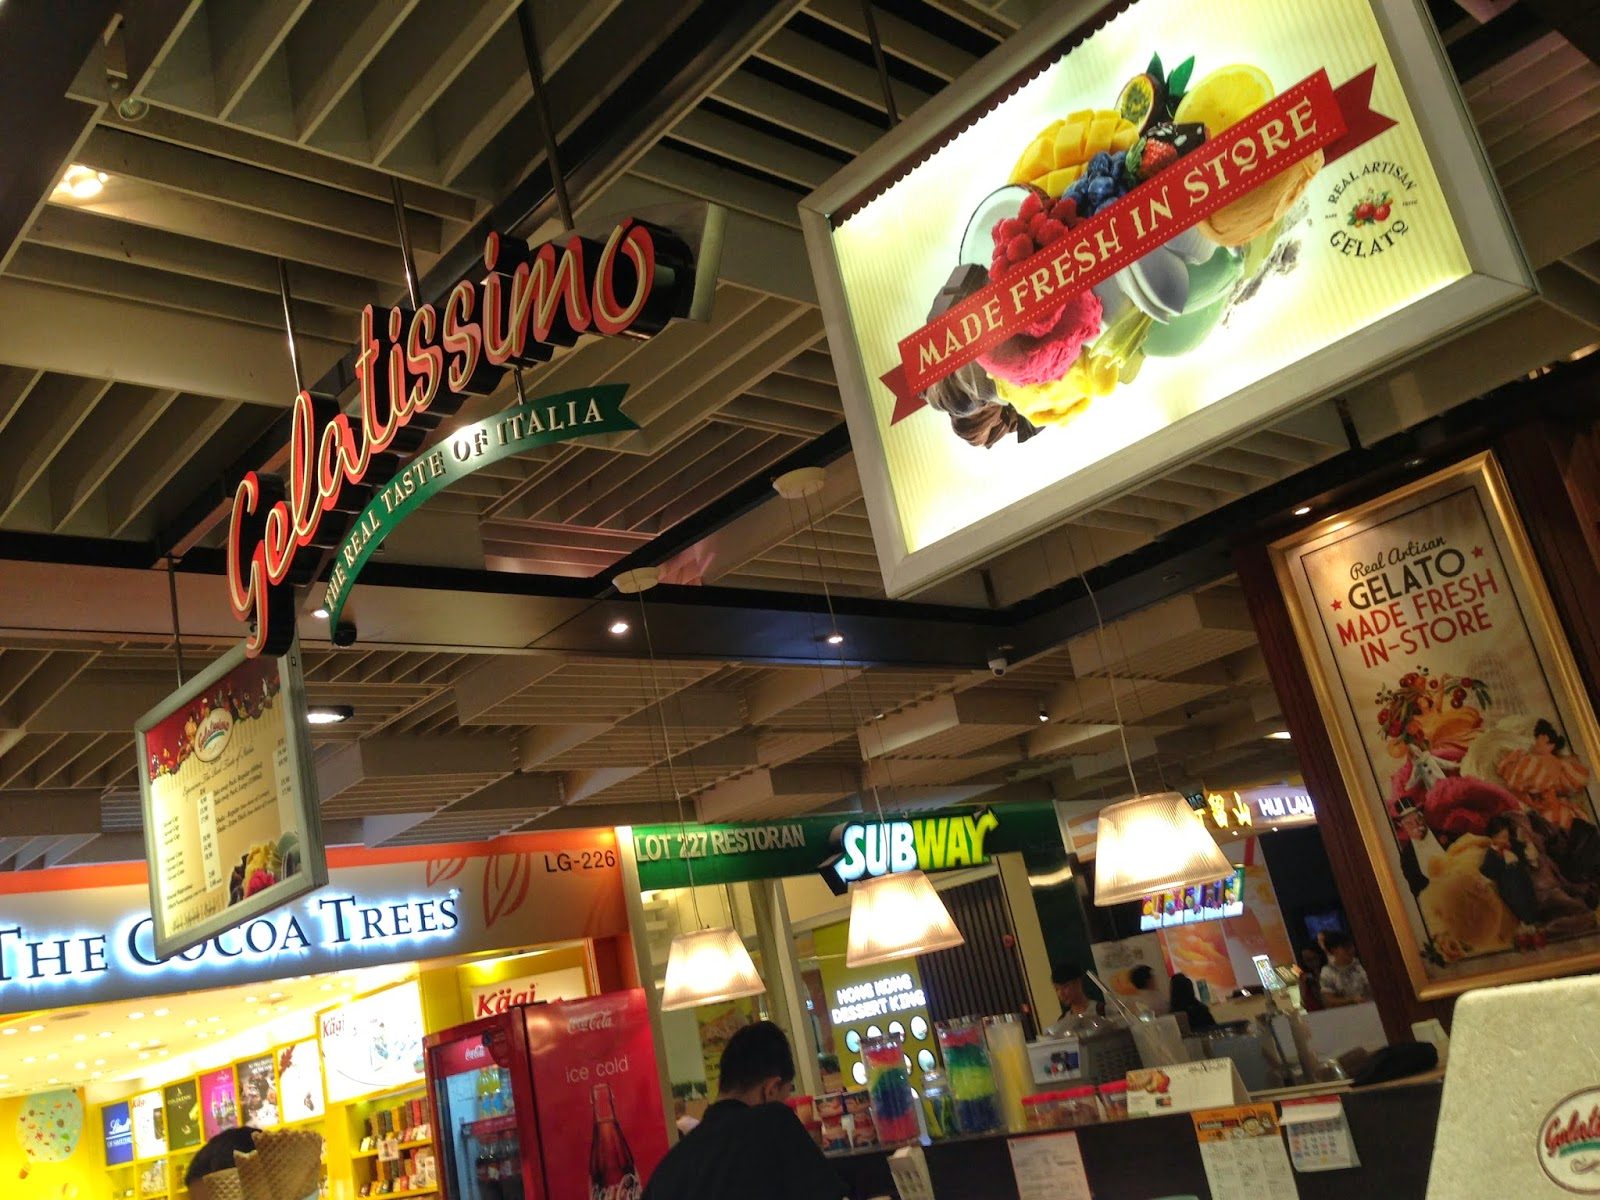 Worthy Book: Gelatissimo- The real taste of Italia